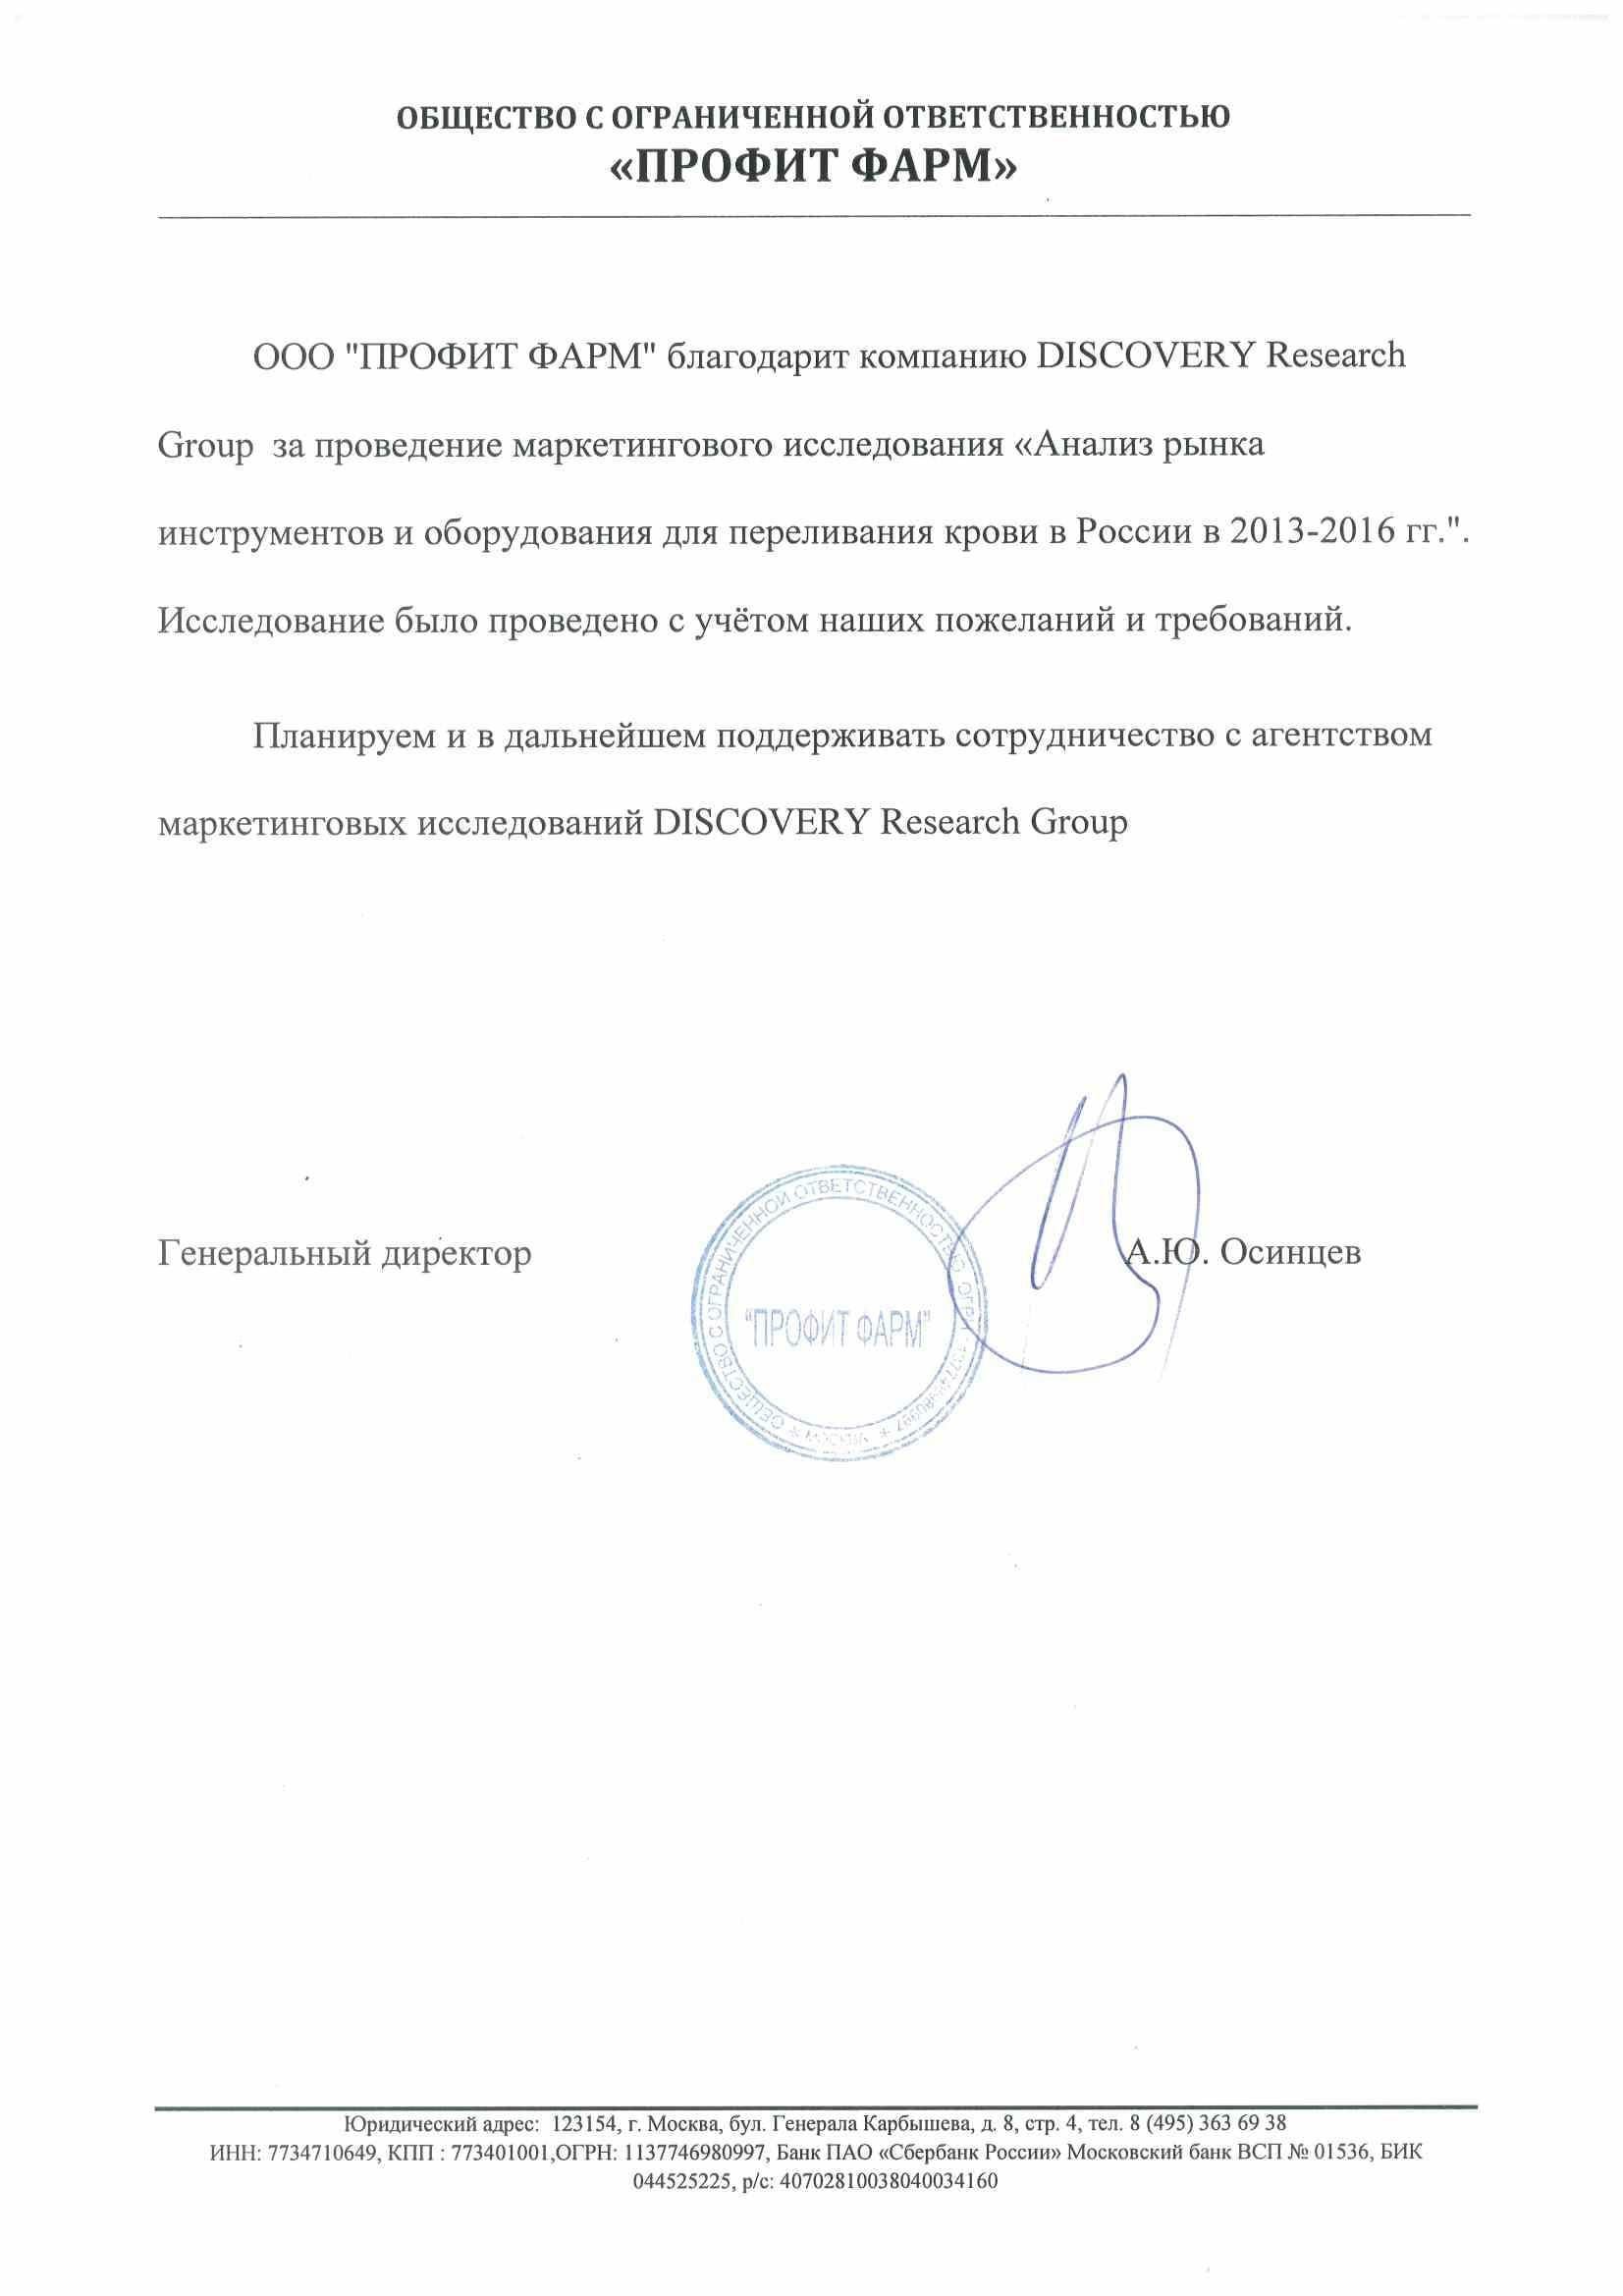 http://drgroup.ru/images/profit.jpg